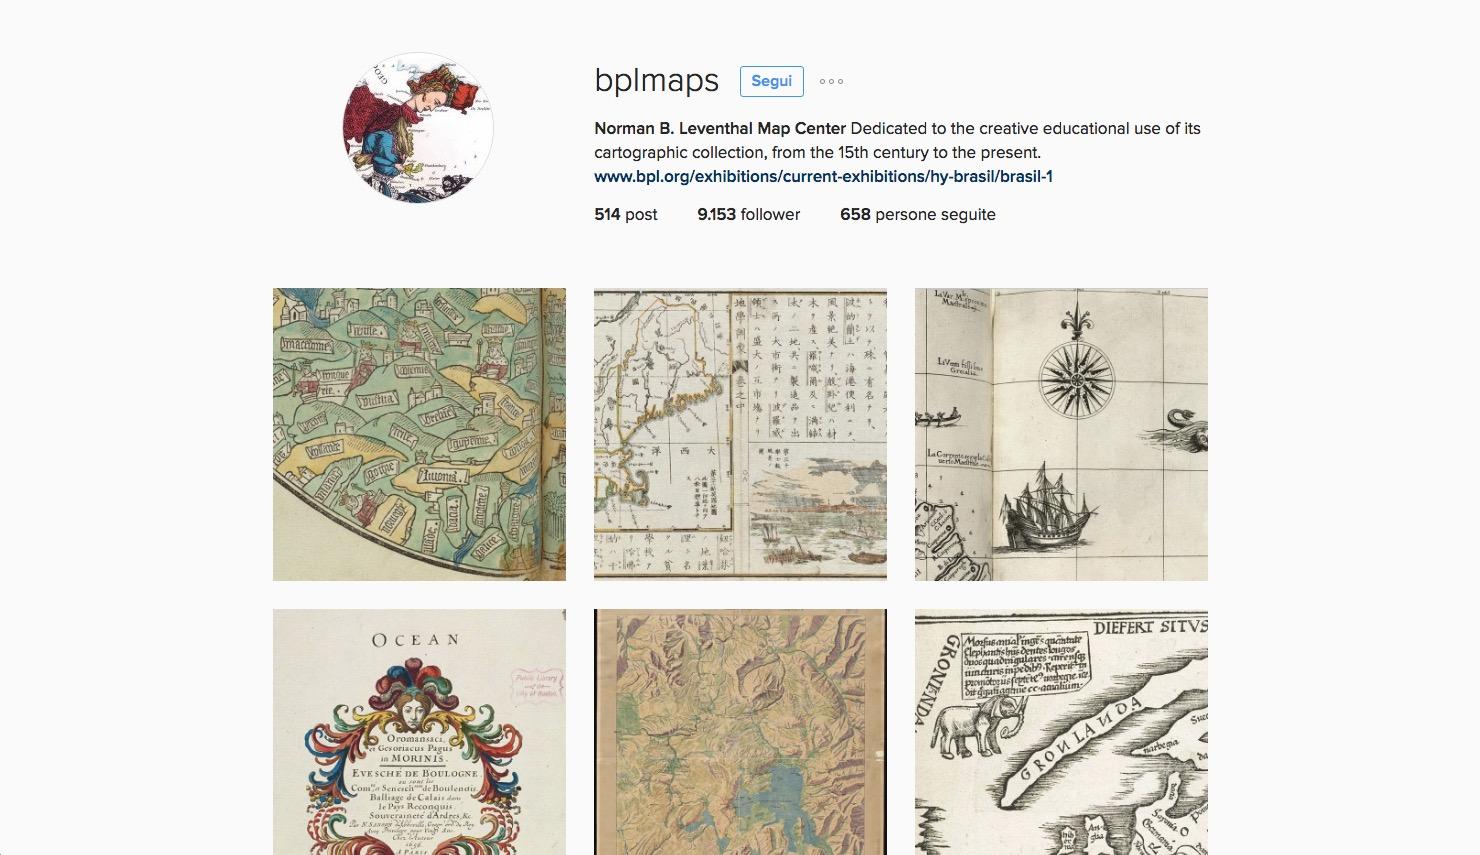 bplmaps